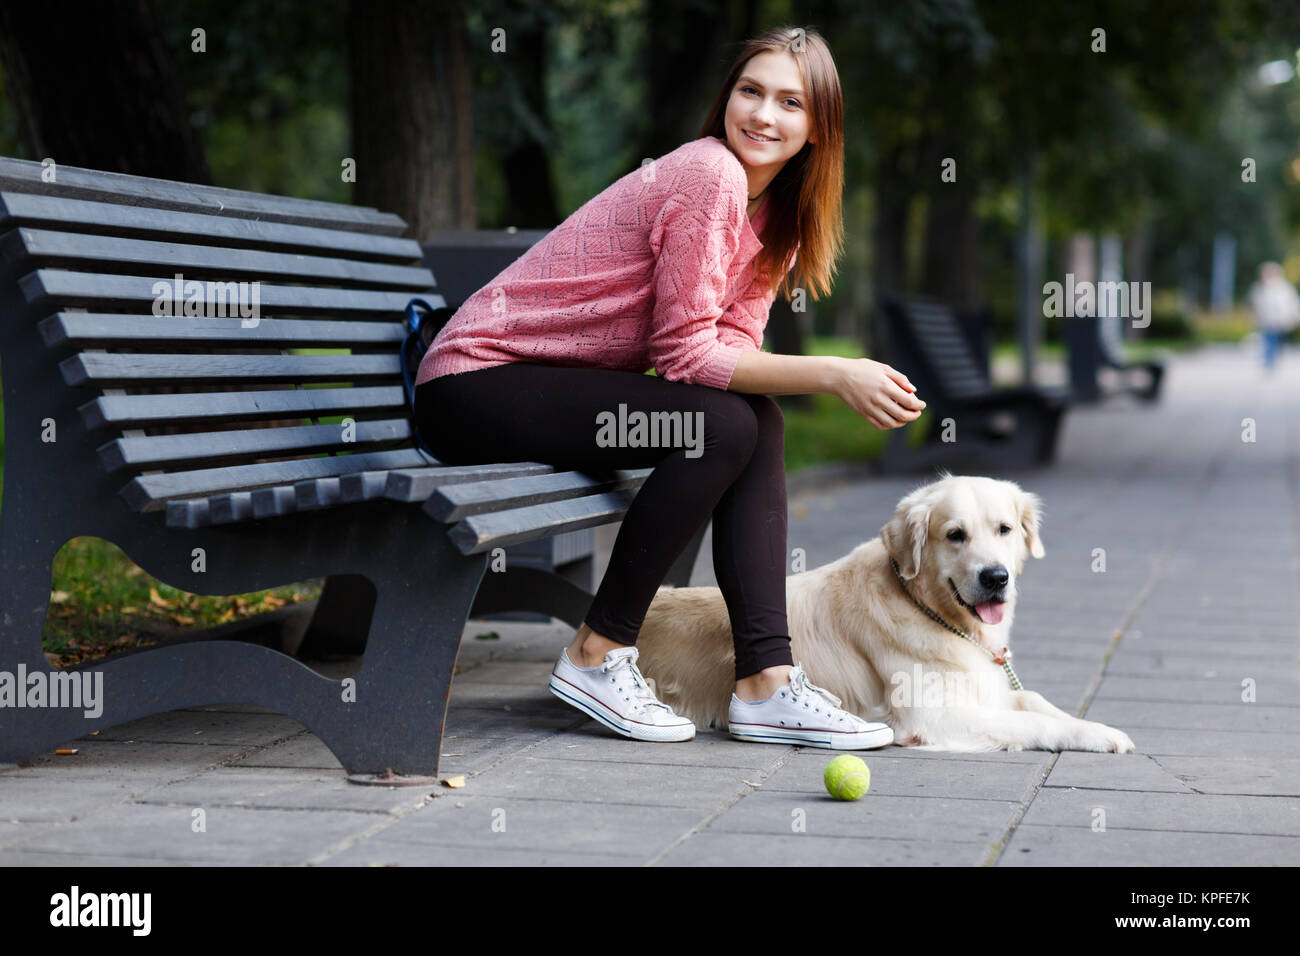 Photo of smiling girl sitting on bench, dog retriever - Stock Image